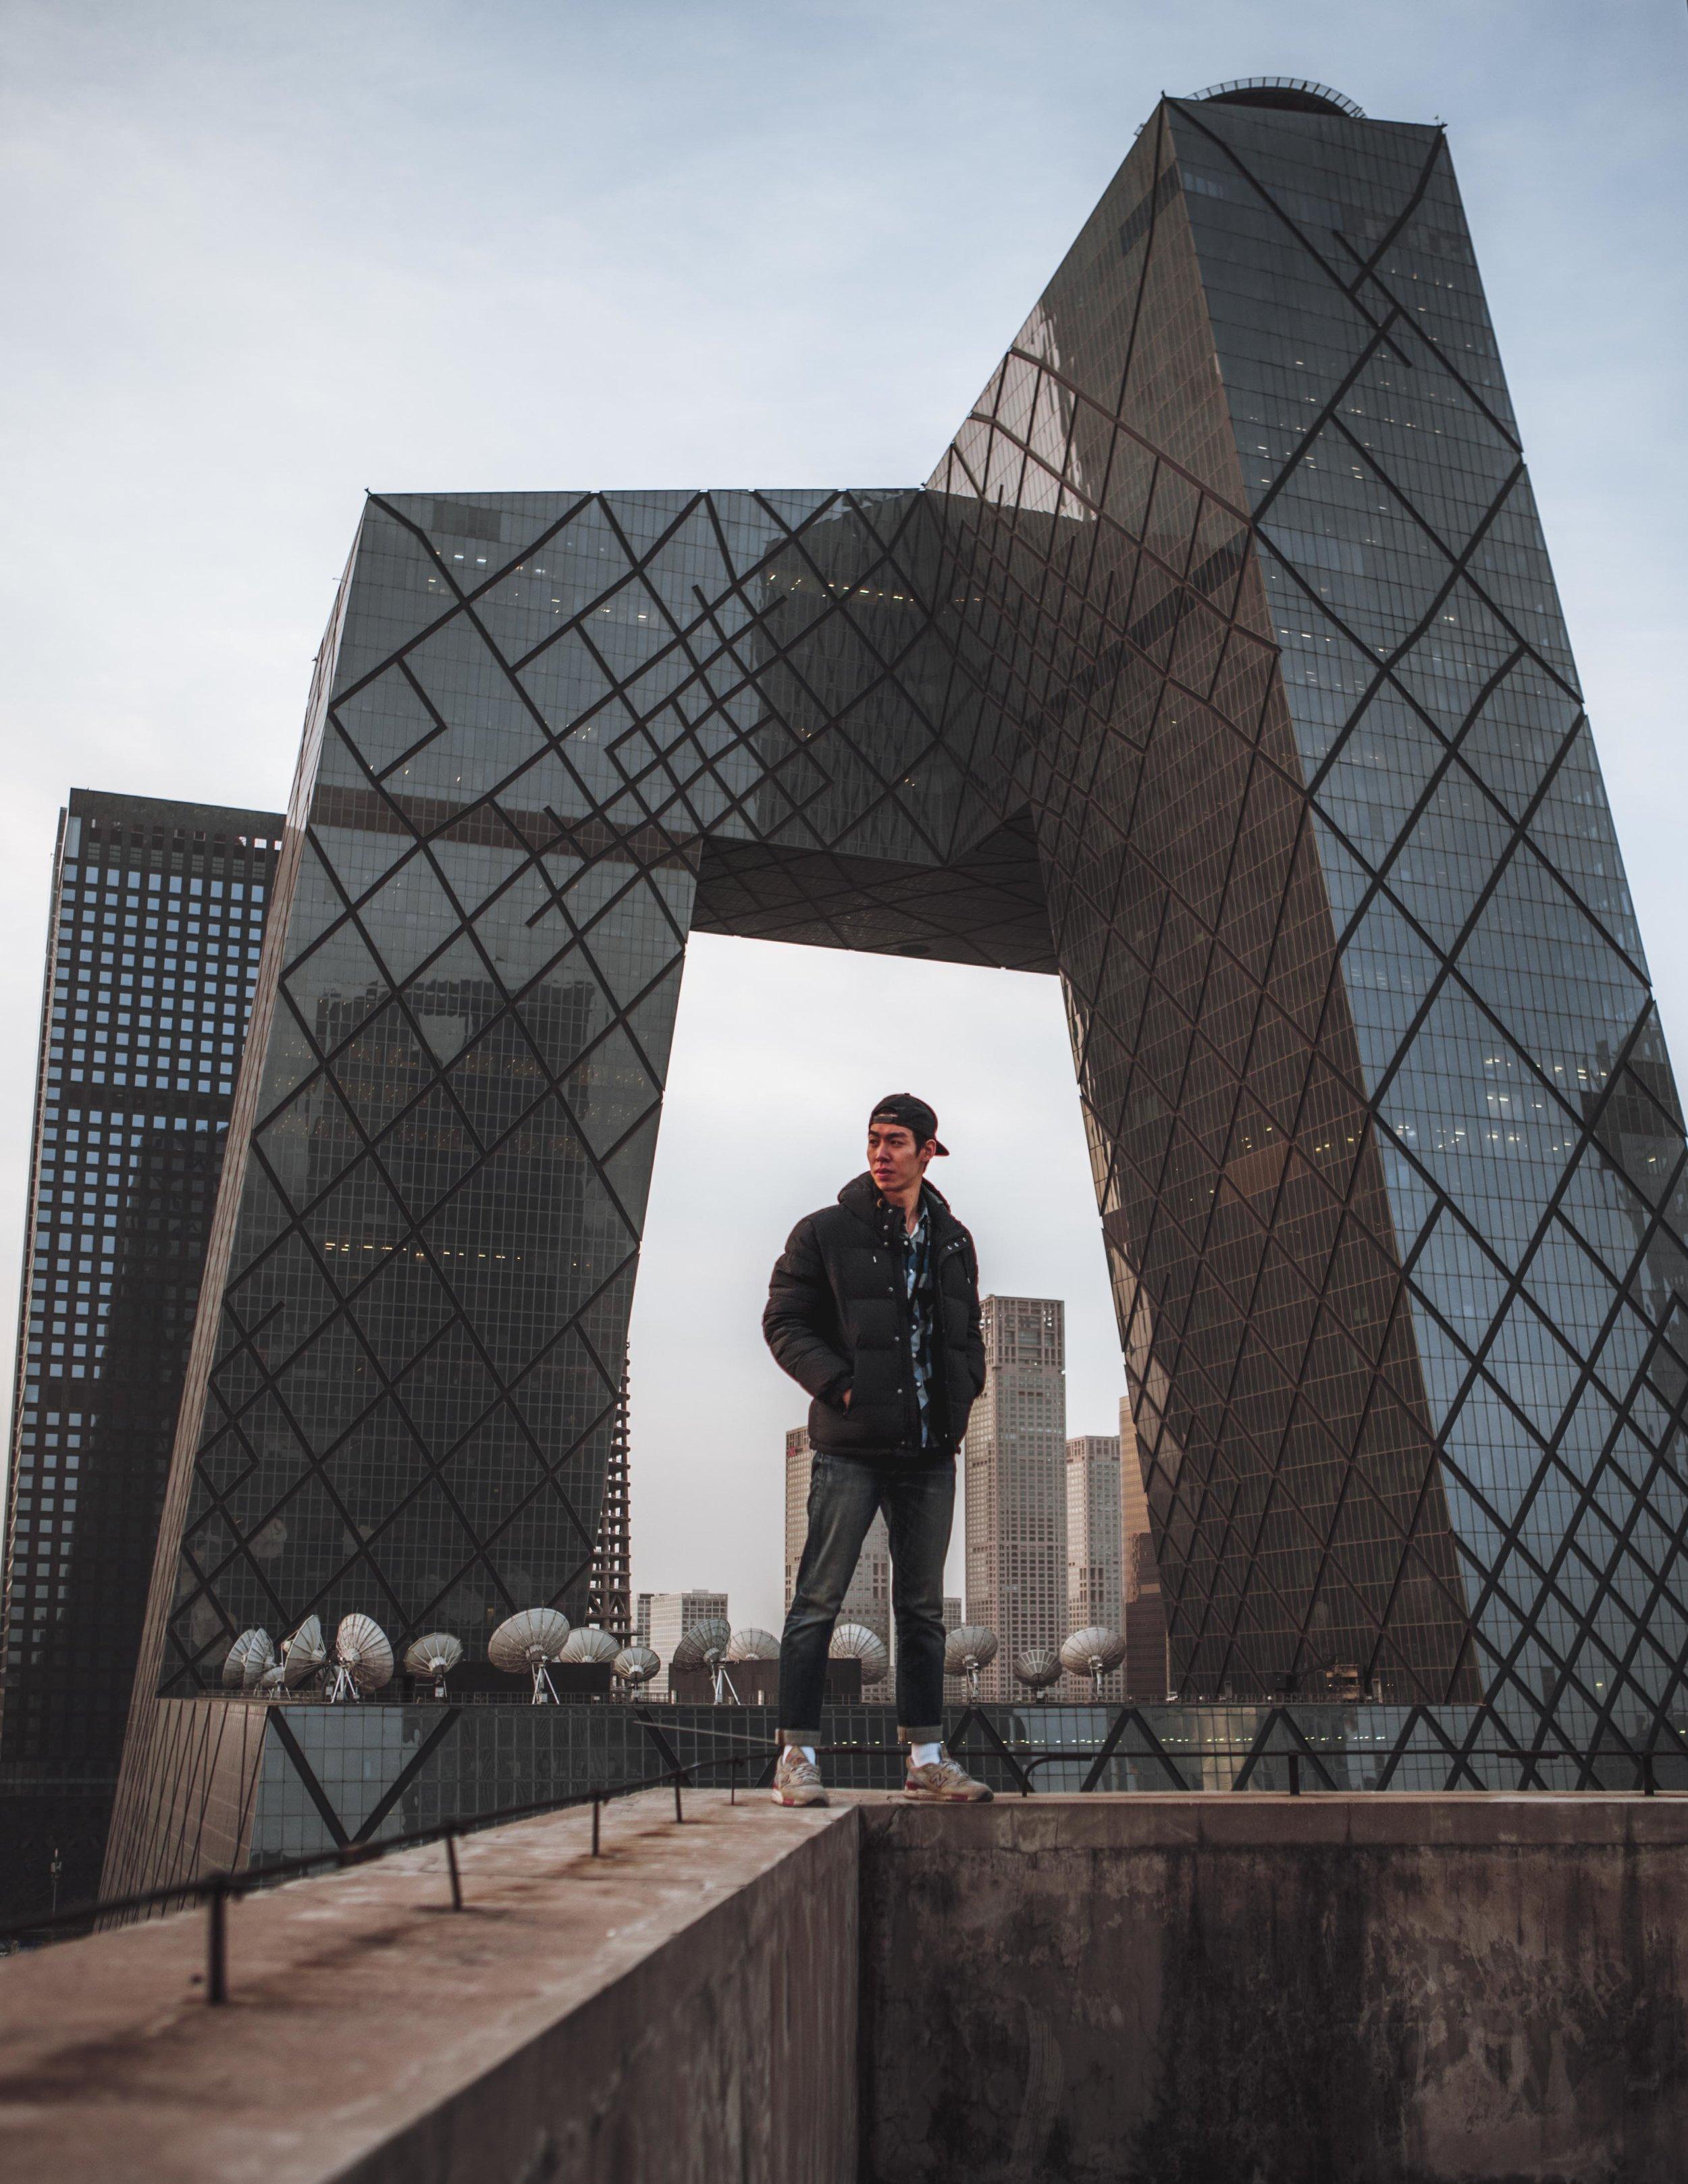 Beijing Final Roofing_Linus_A-1403.jpg